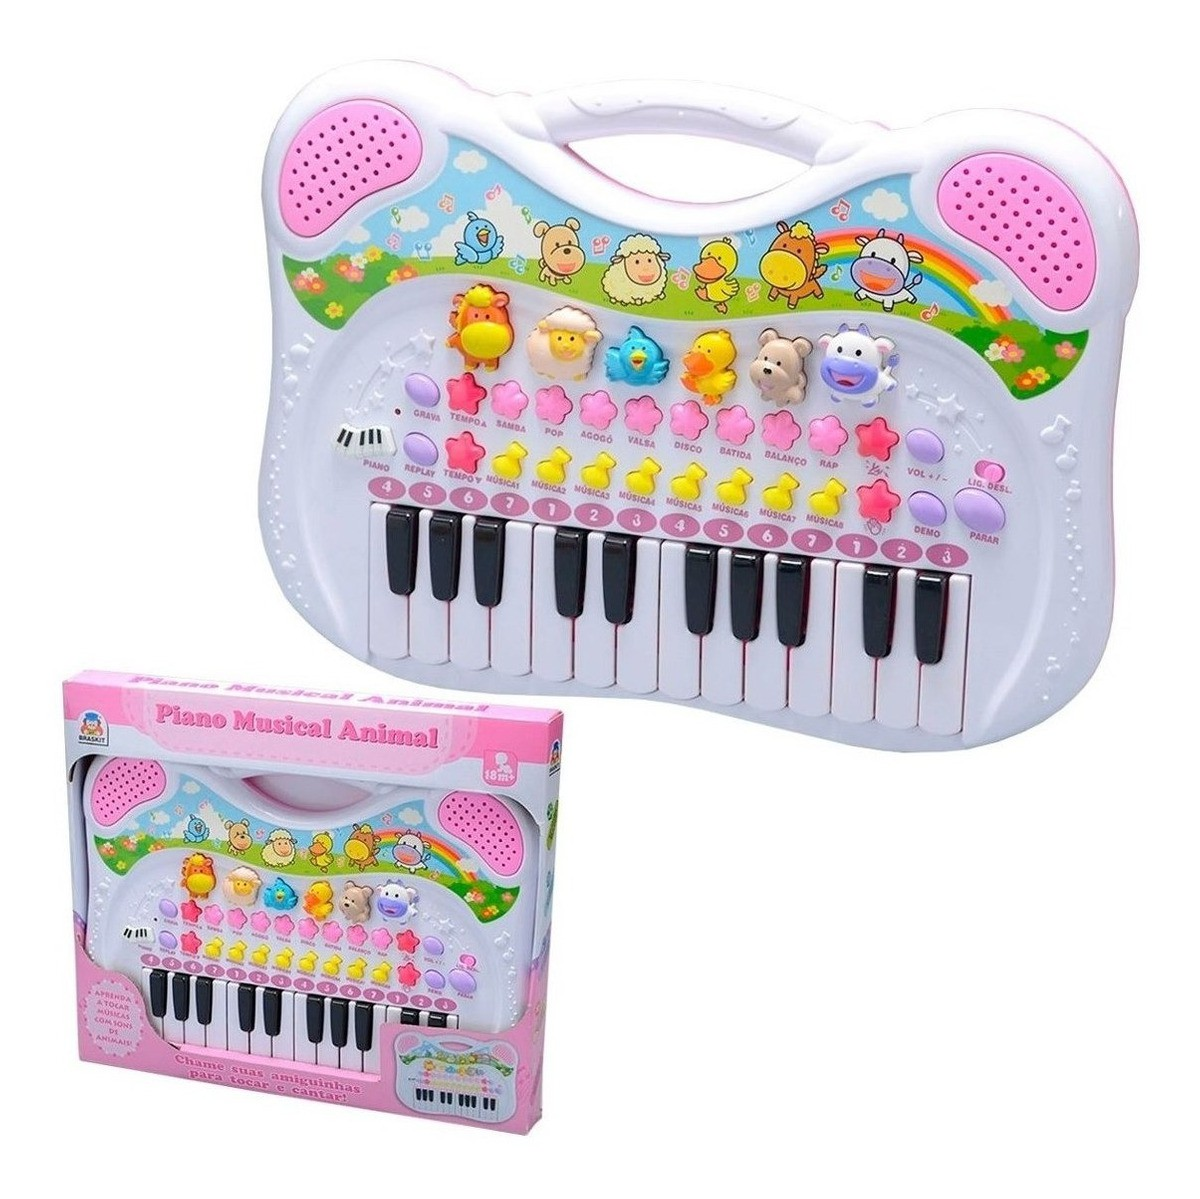 Piano Musical Animal